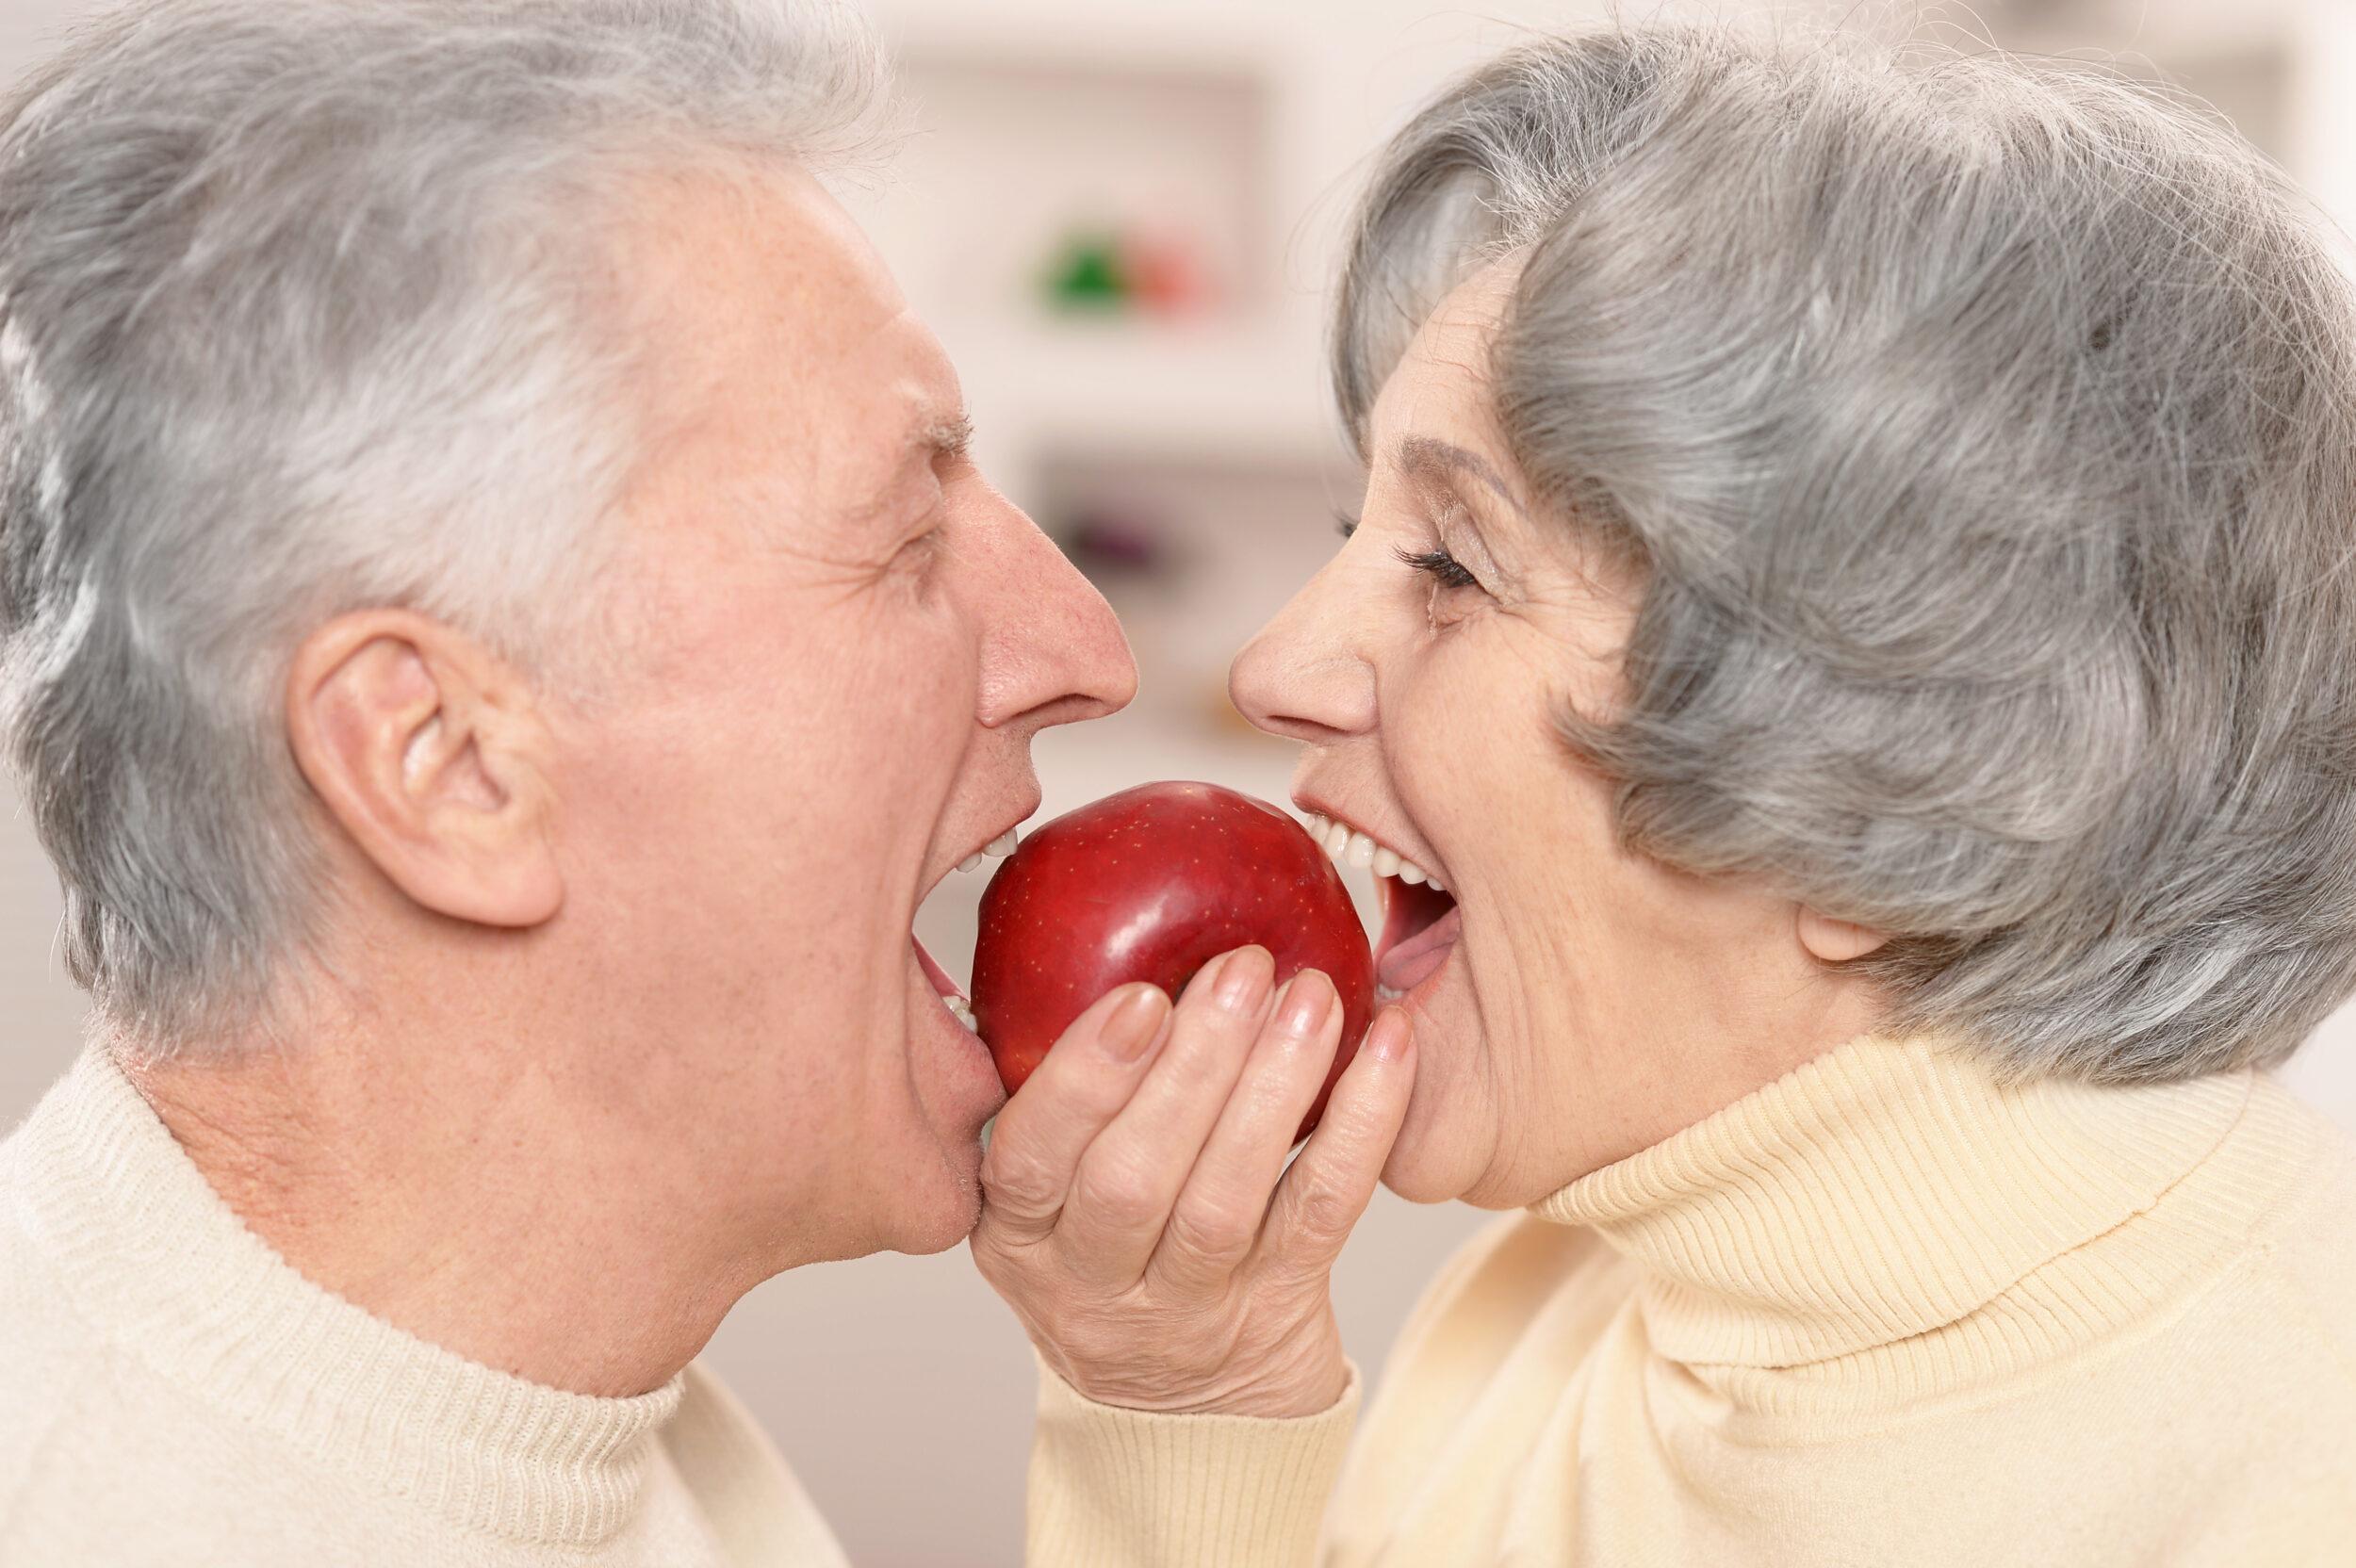 Cute Older Couple Biting Apple Together